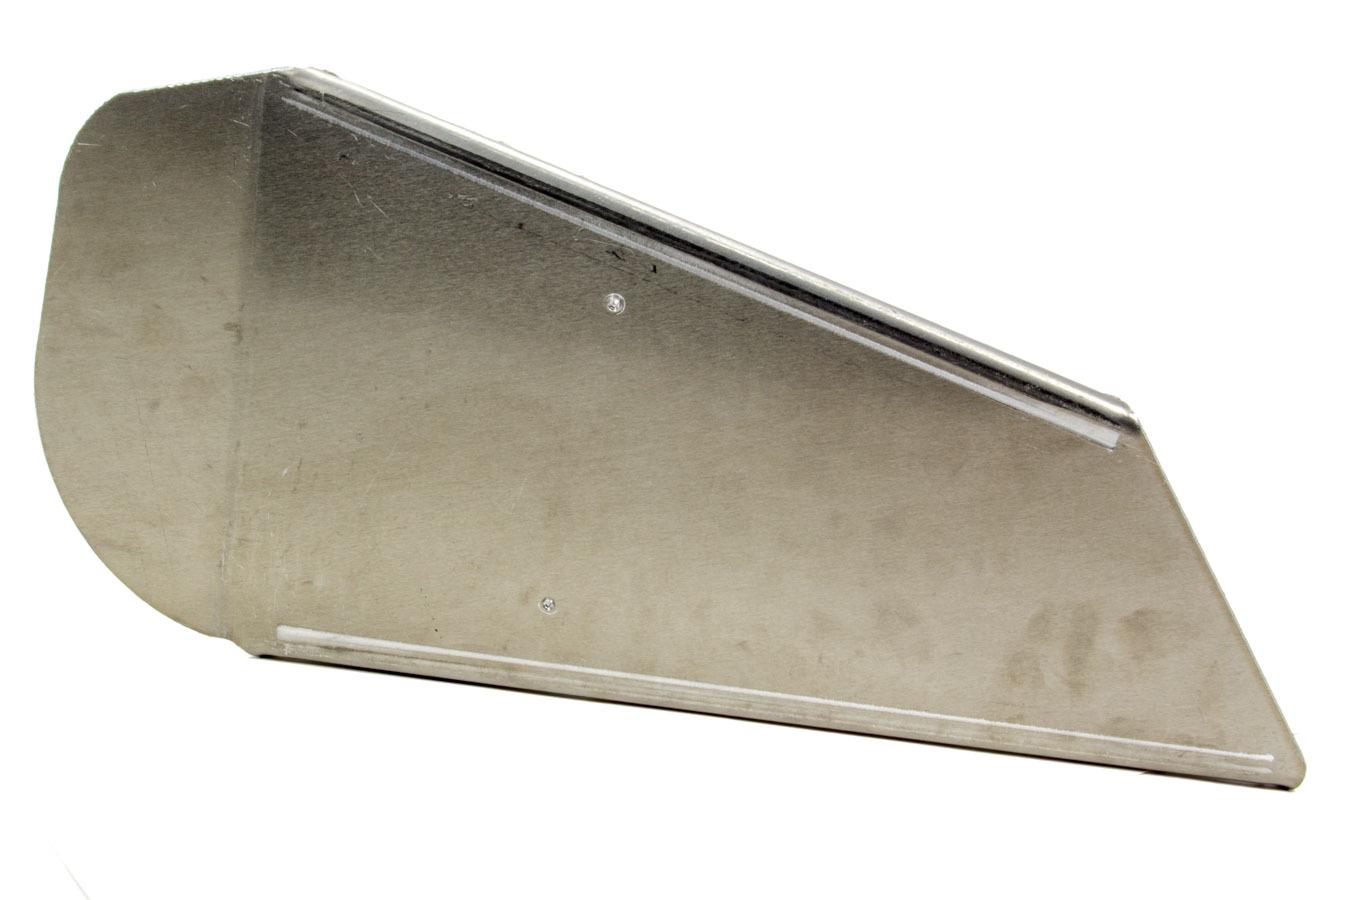 Ultra Shield 91040 Leg Support, Adult, Right, Aluminum, Natural, Ultrashield Seats, Each